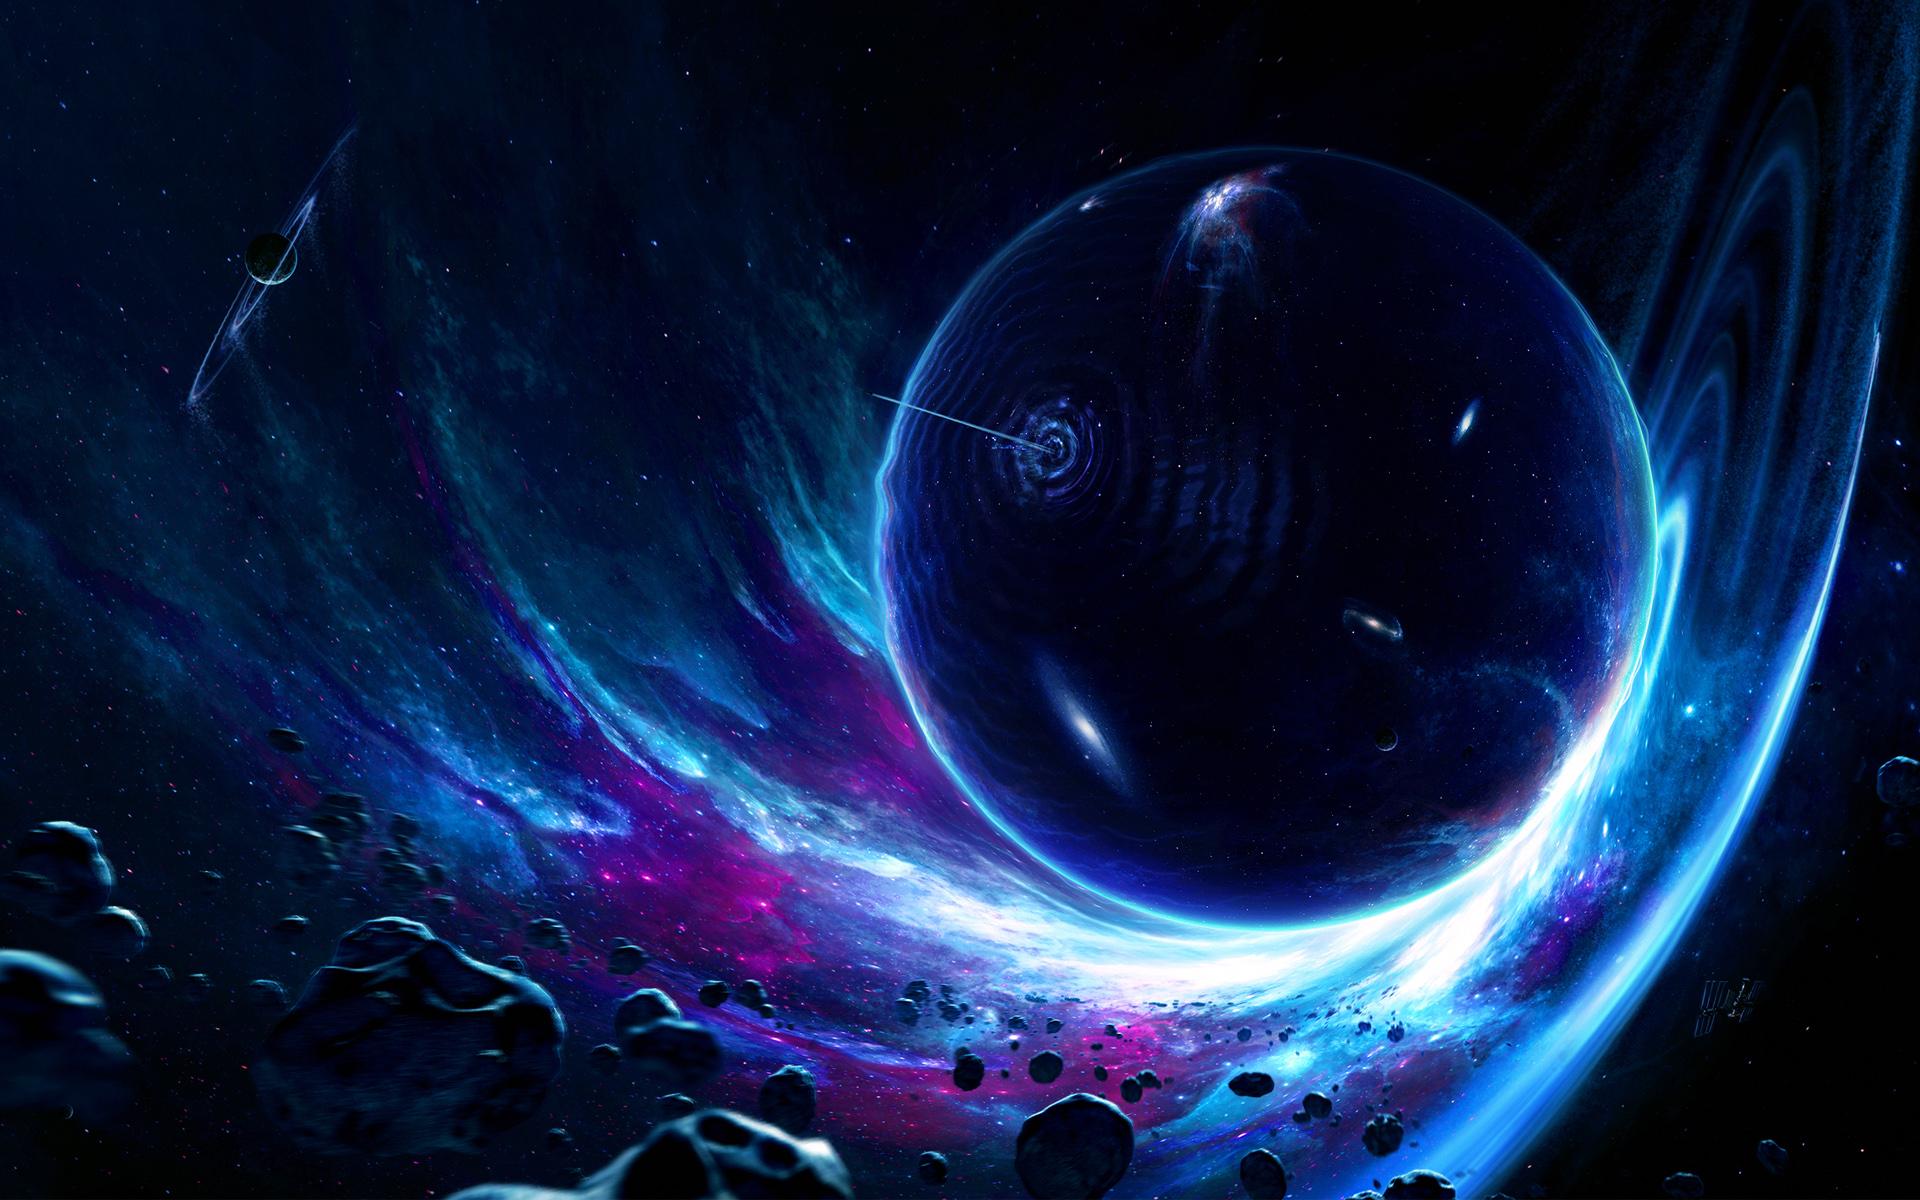 Wormhole5475518584 - Wormhole - Wormhole, Space